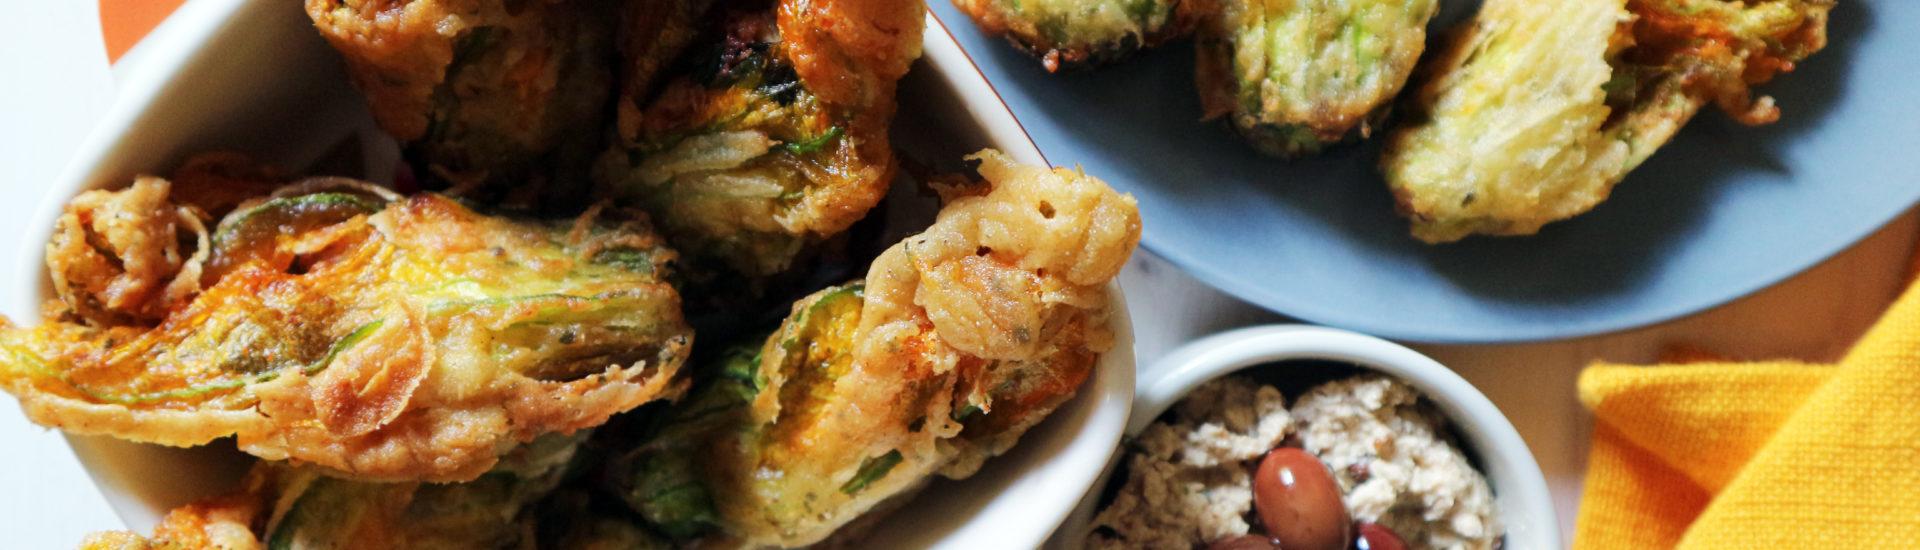 fiori di zucca ripieni e fritti vegan